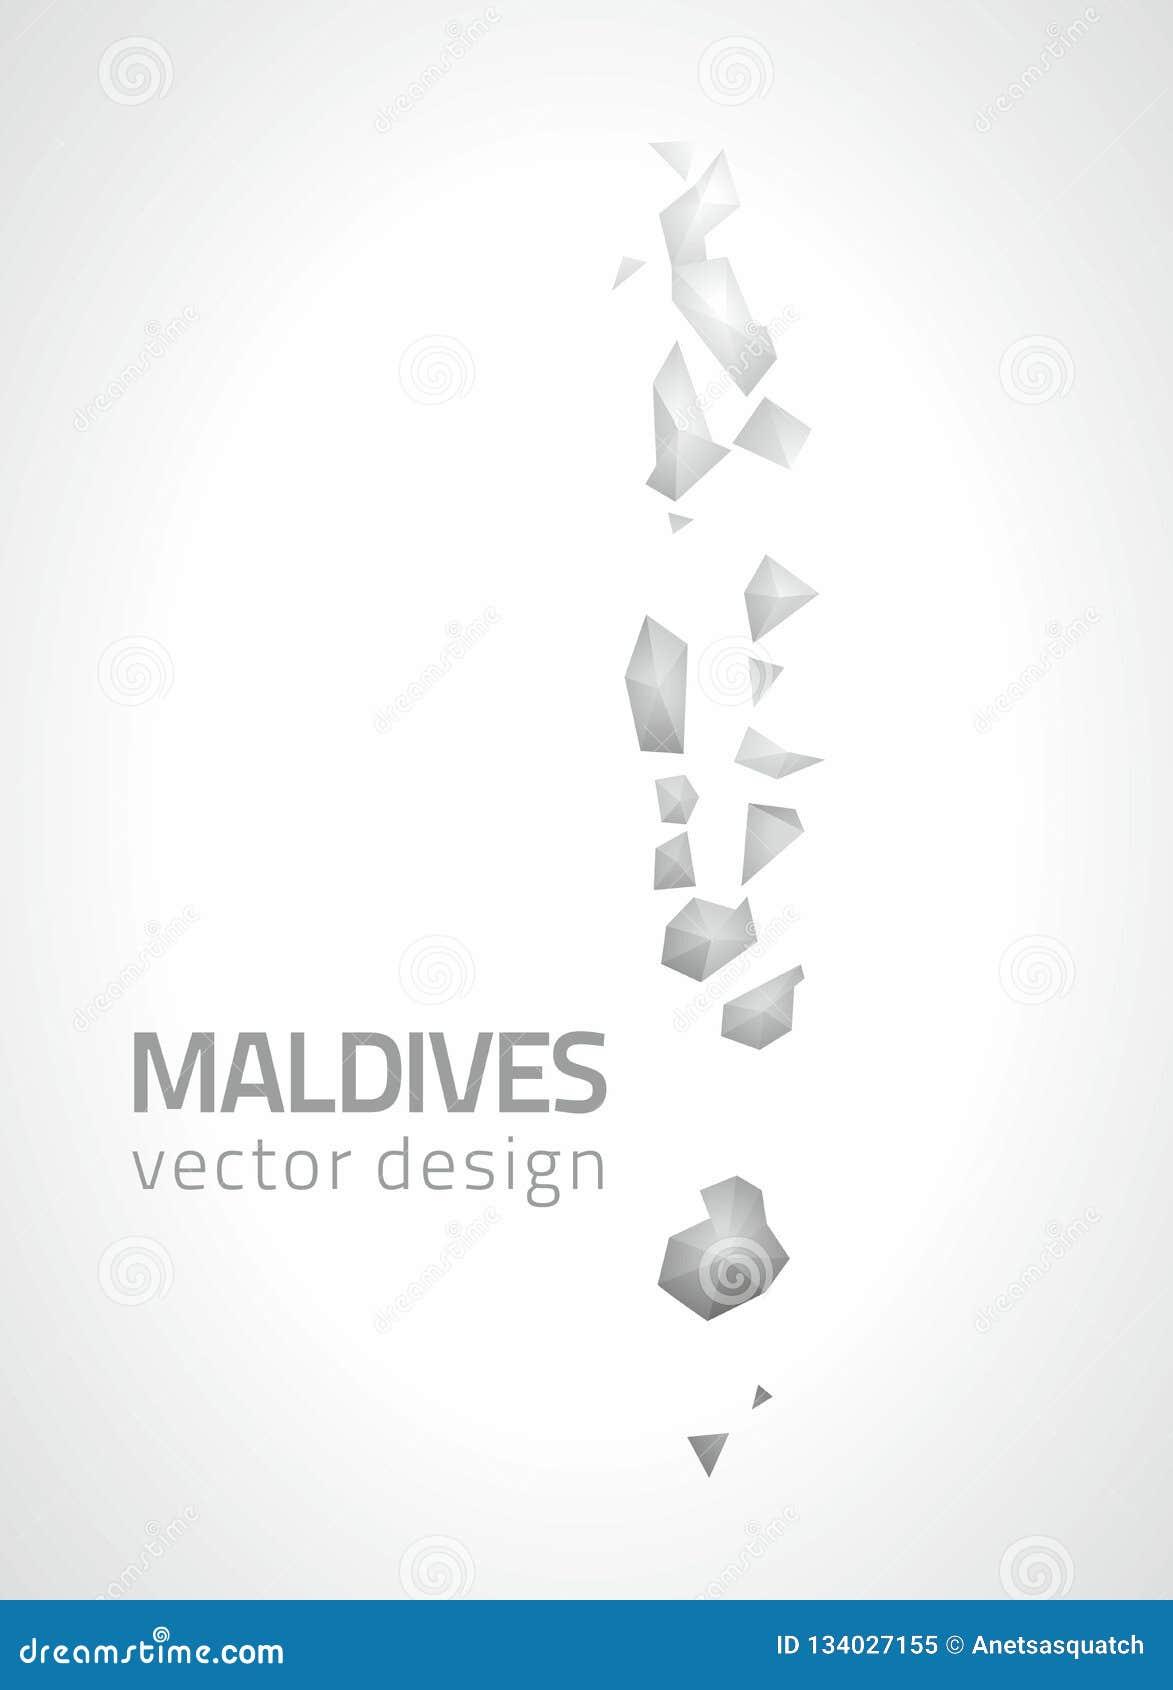 Maldives Polygonal Triangle Grey And Silver Vector Map Stock Vector ...